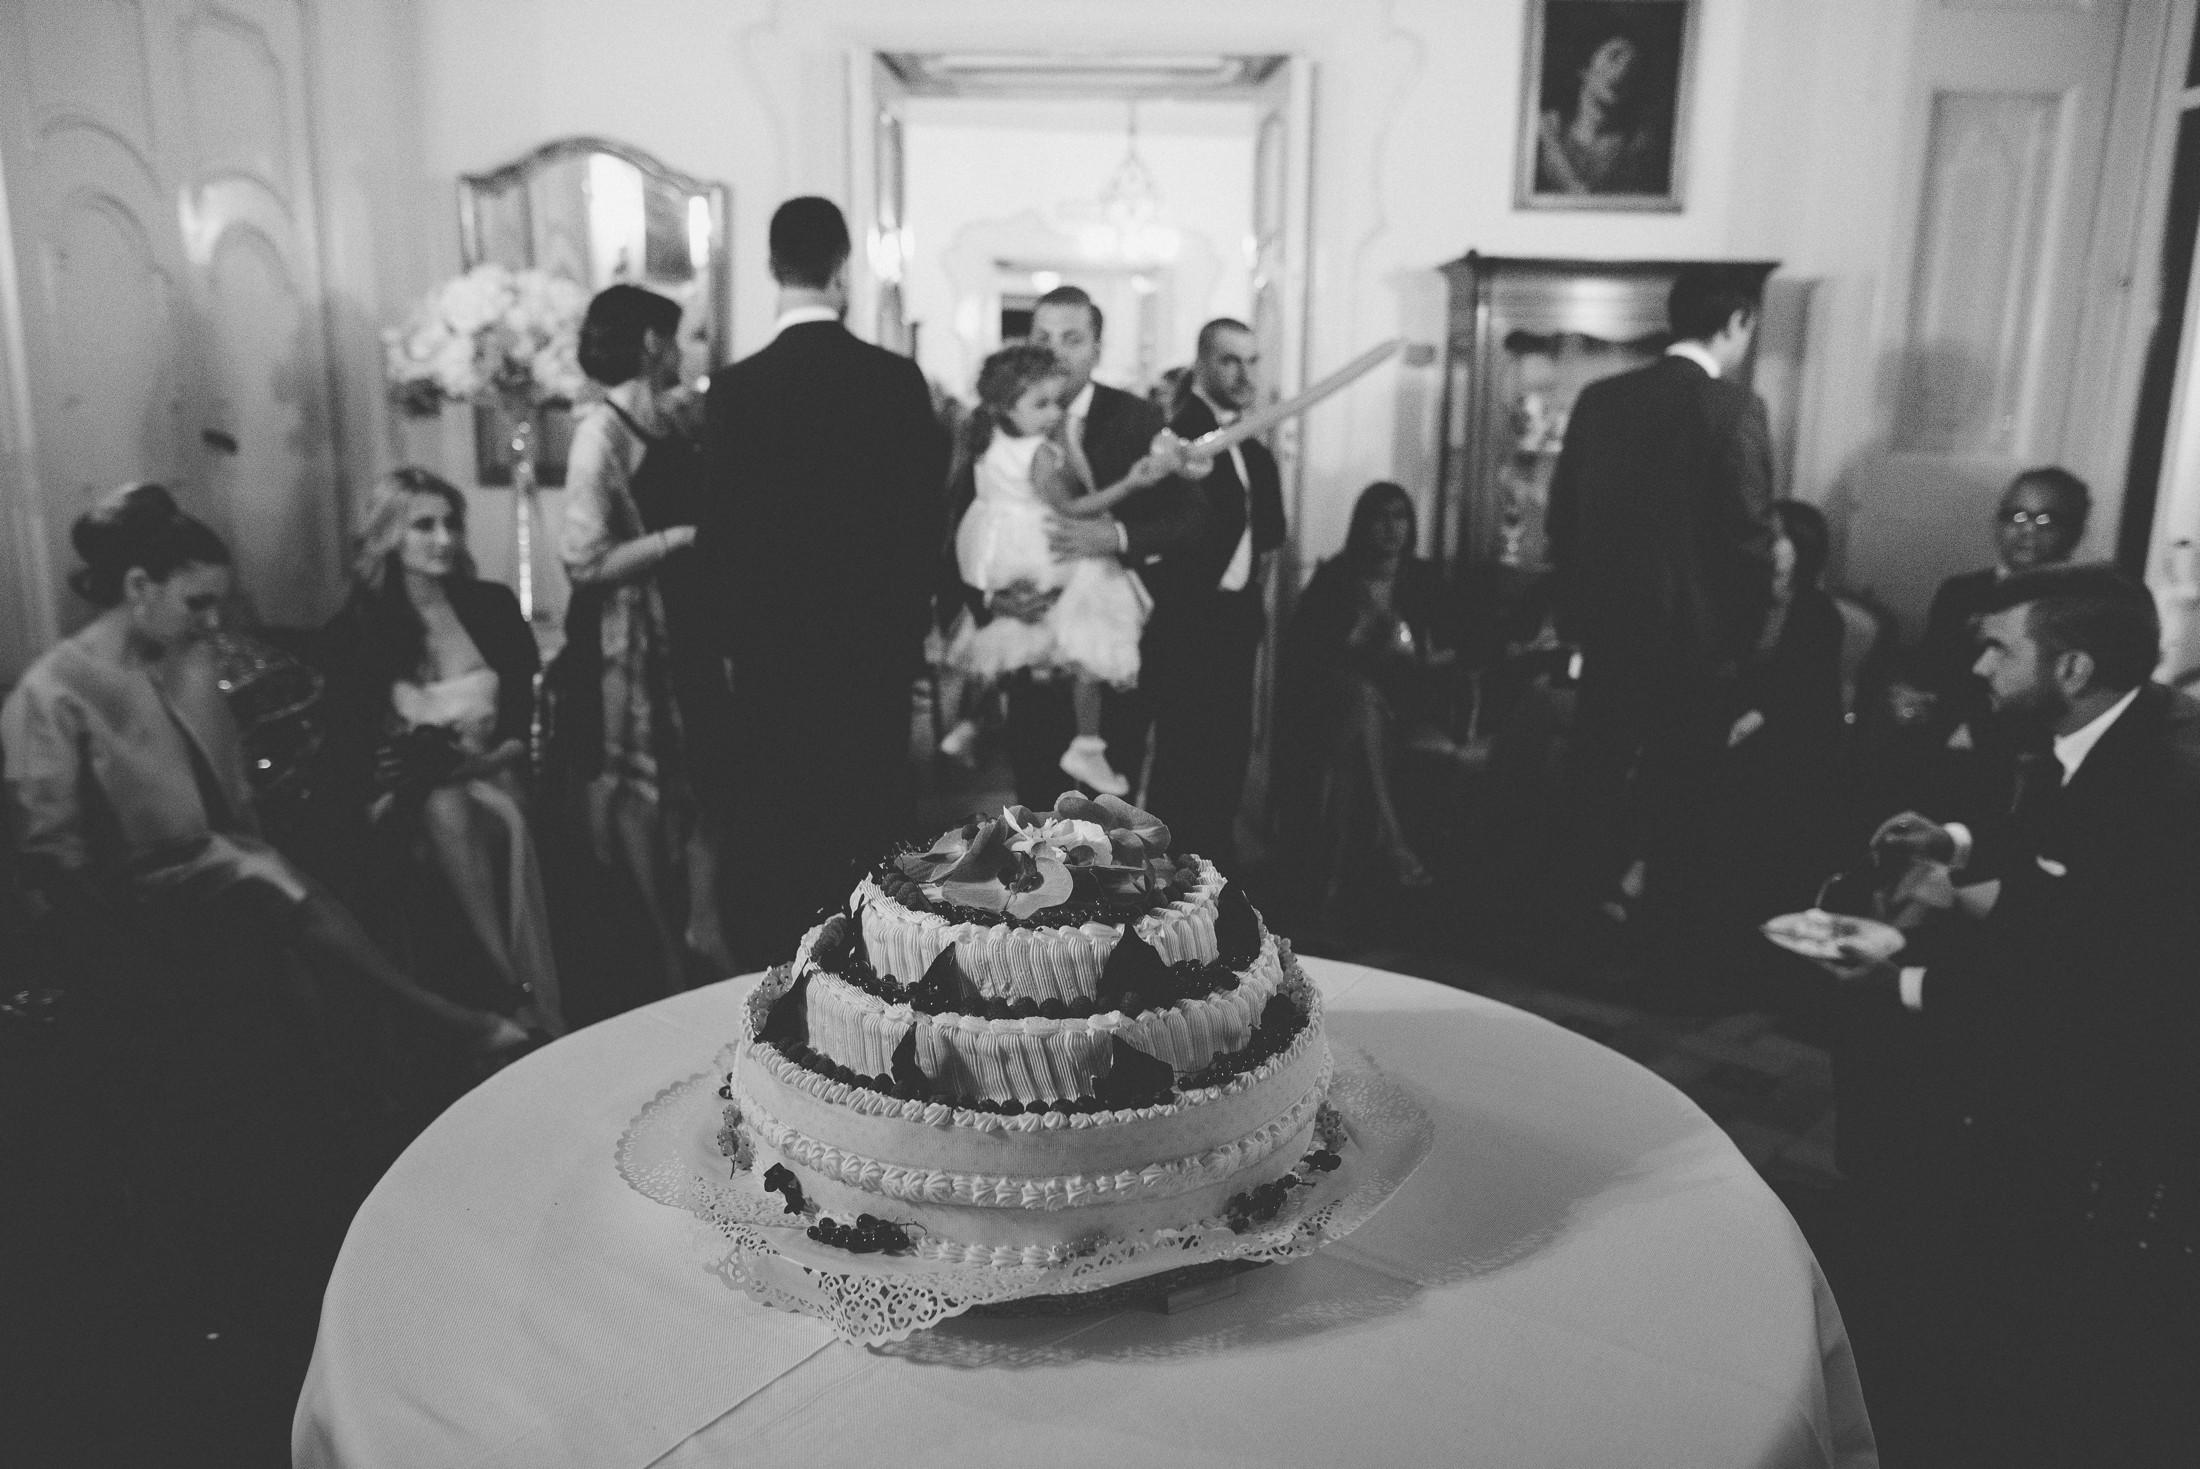 adriana alfano wedding cake in black and white at hotel palumbo ravello italy